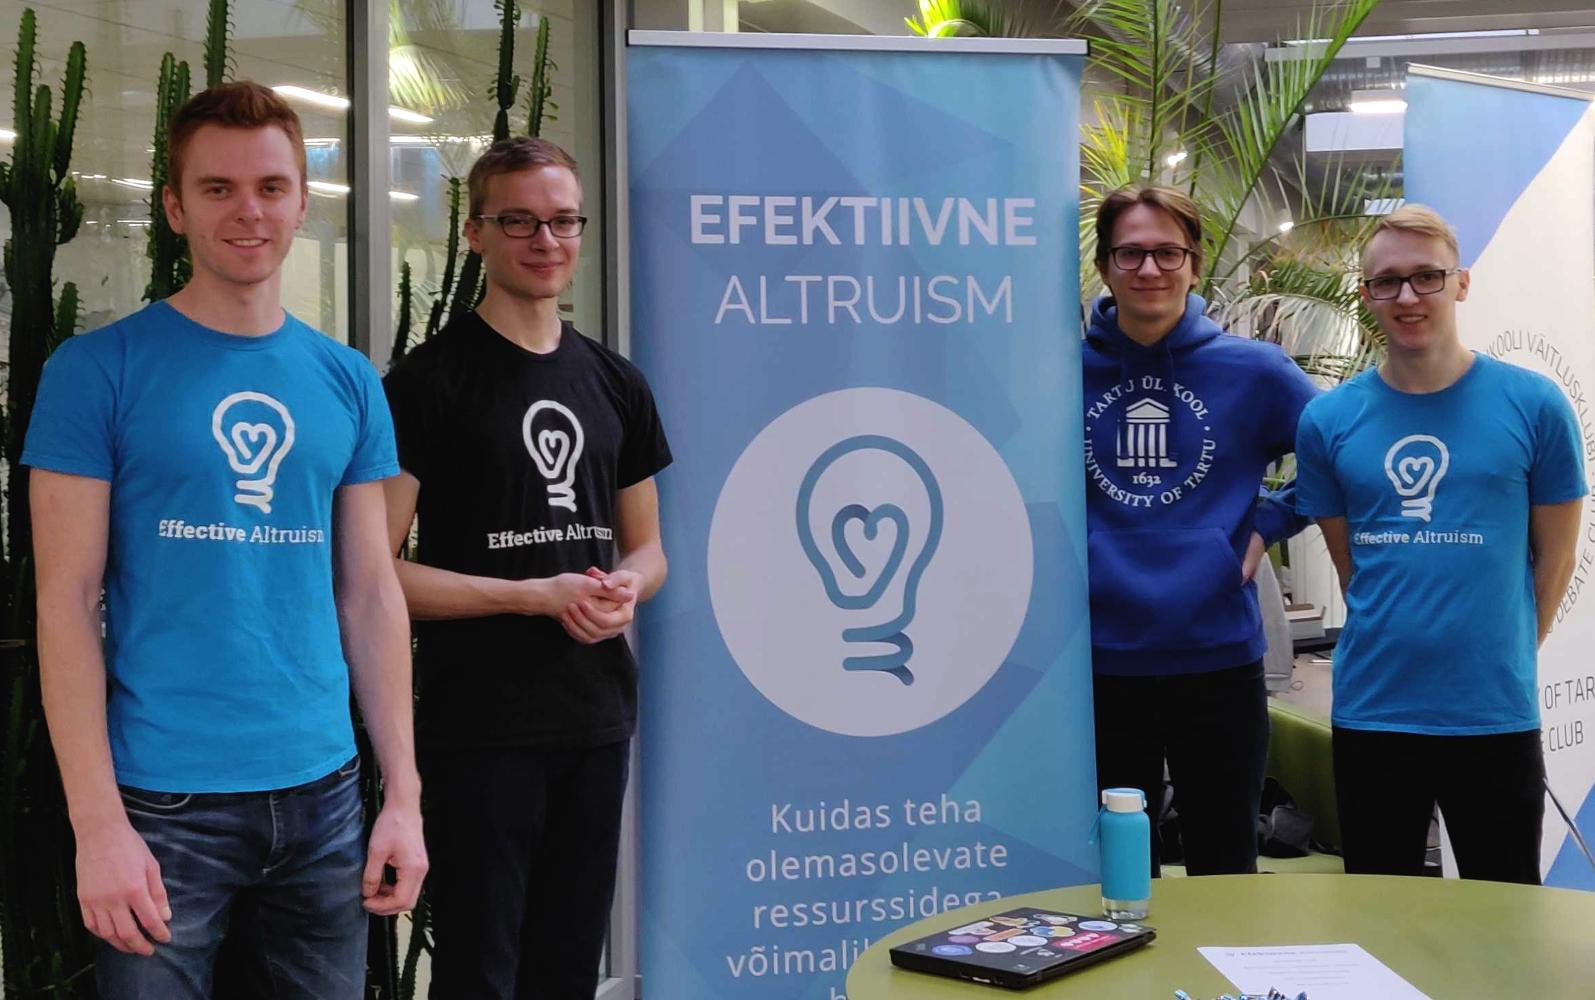 Efektiivse altruismi liikmed levitamas efektiivse altruismi ideid